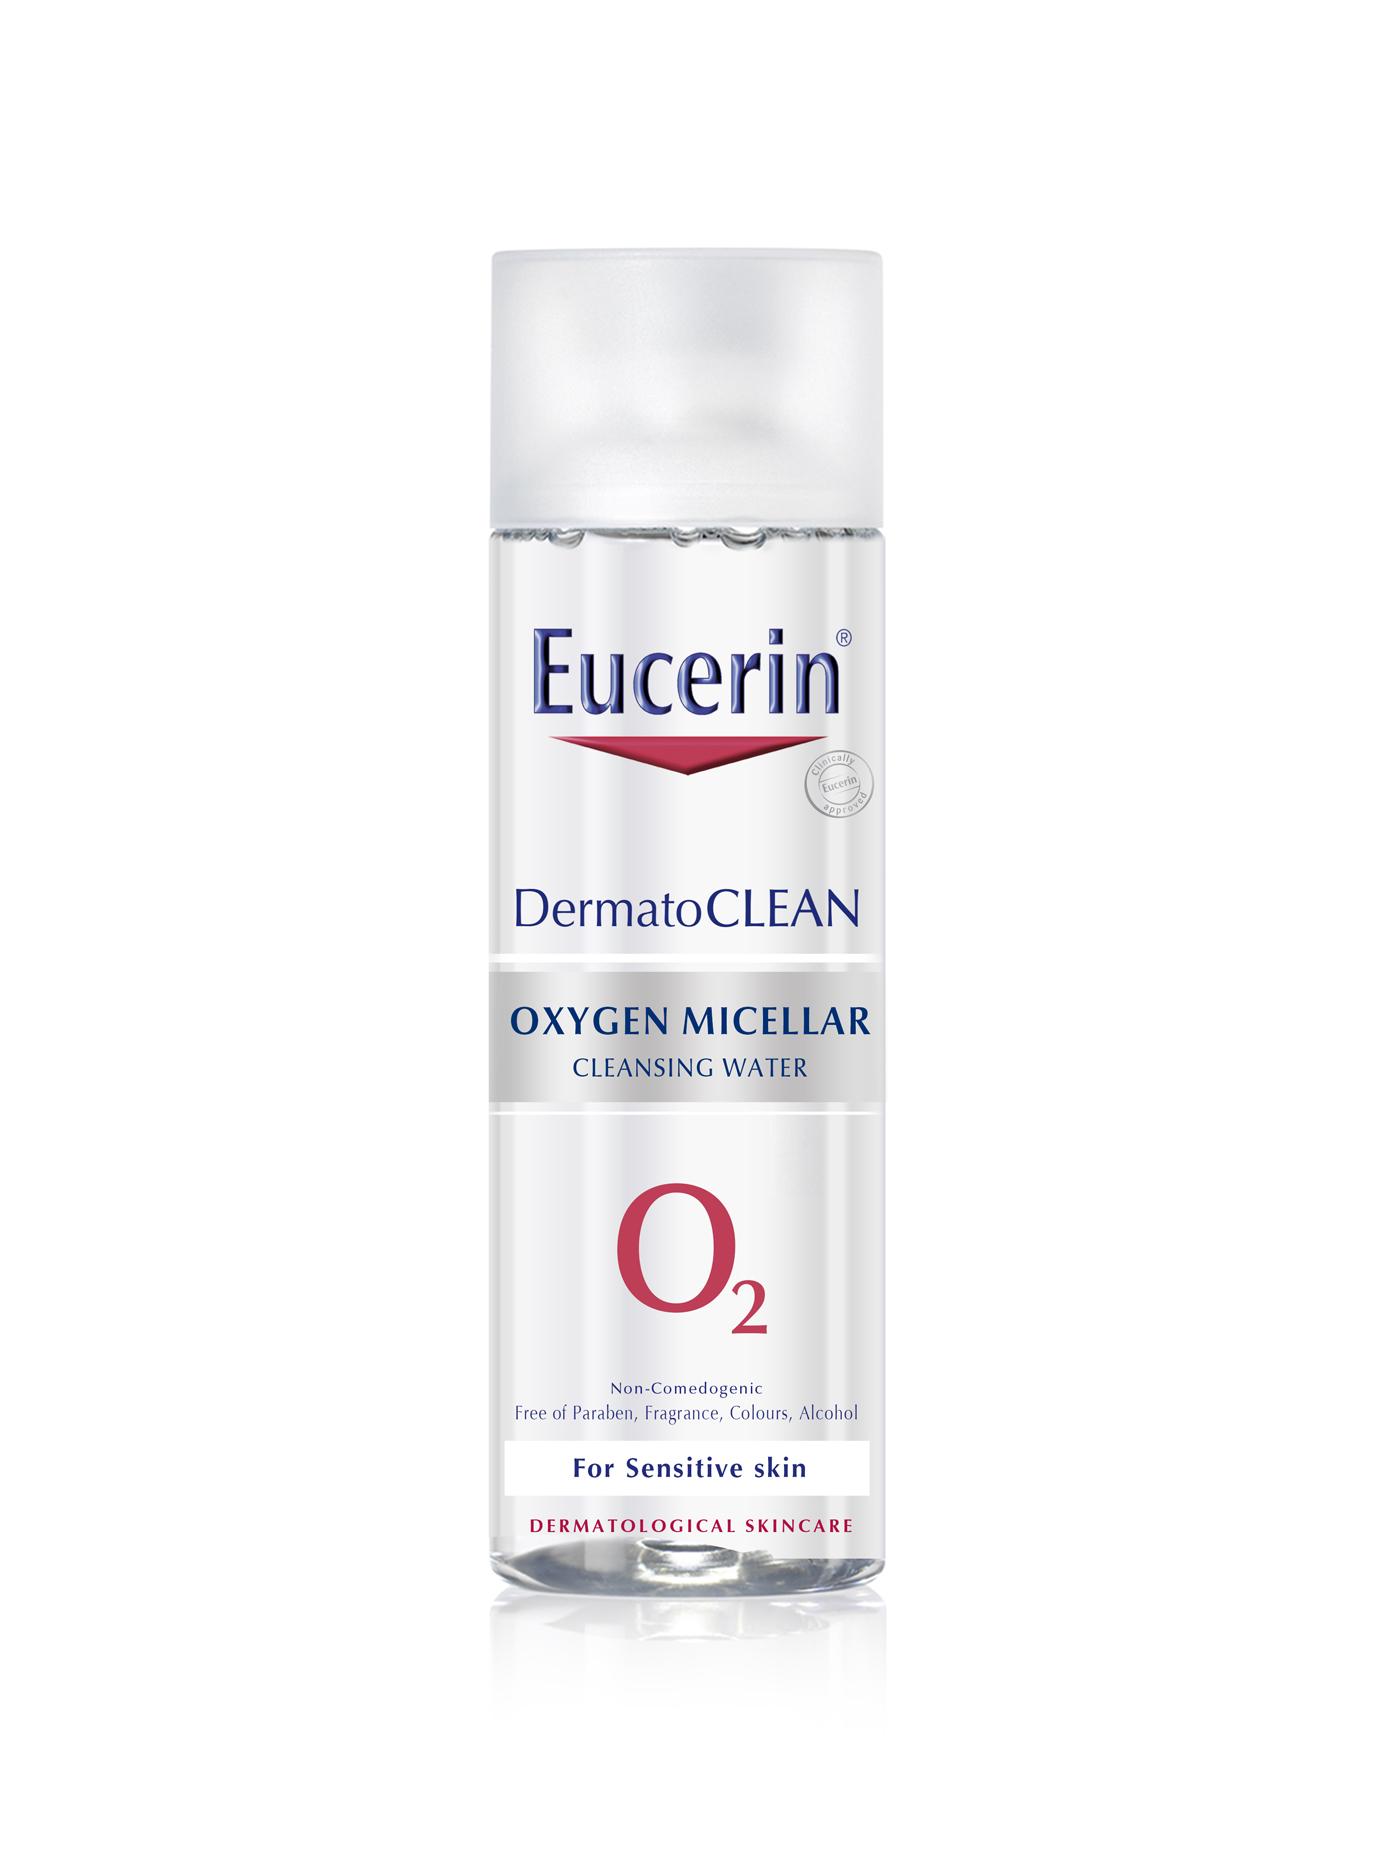 EUCERIN ผลิตภัณฑ์ทำความสะอาดเครื่องสำอางค์ ไมเซลล่า เดอร์มาโทคลีน ขนาด 200 มล.